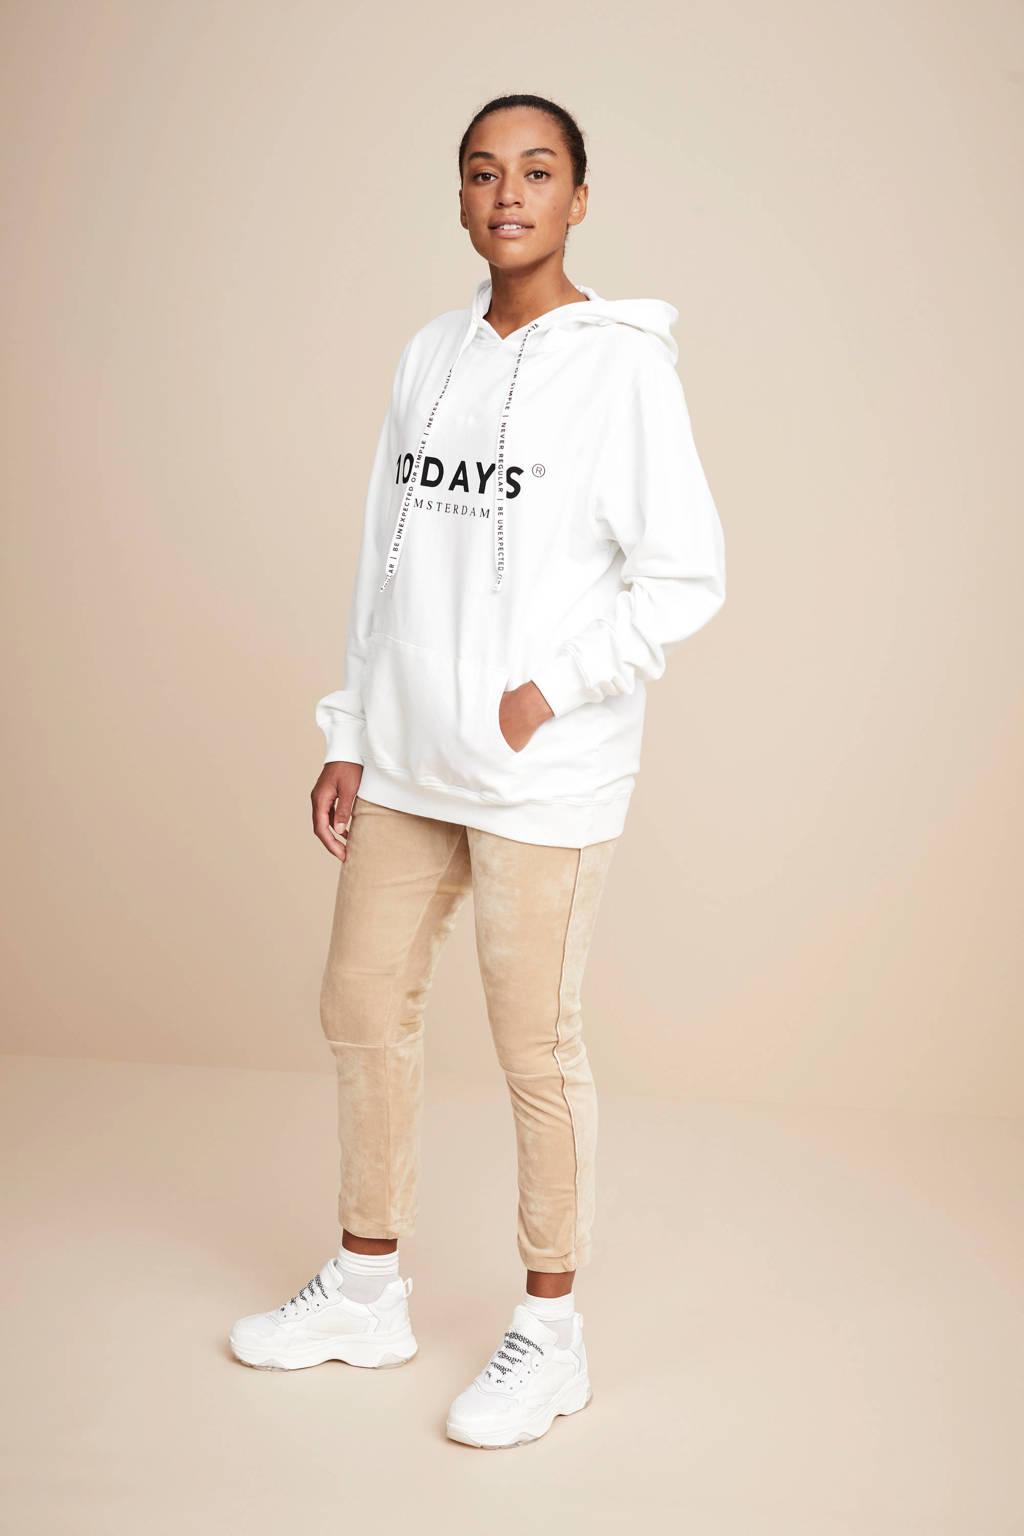 10DAYS hoodie met printopdruk, Wit/zwart